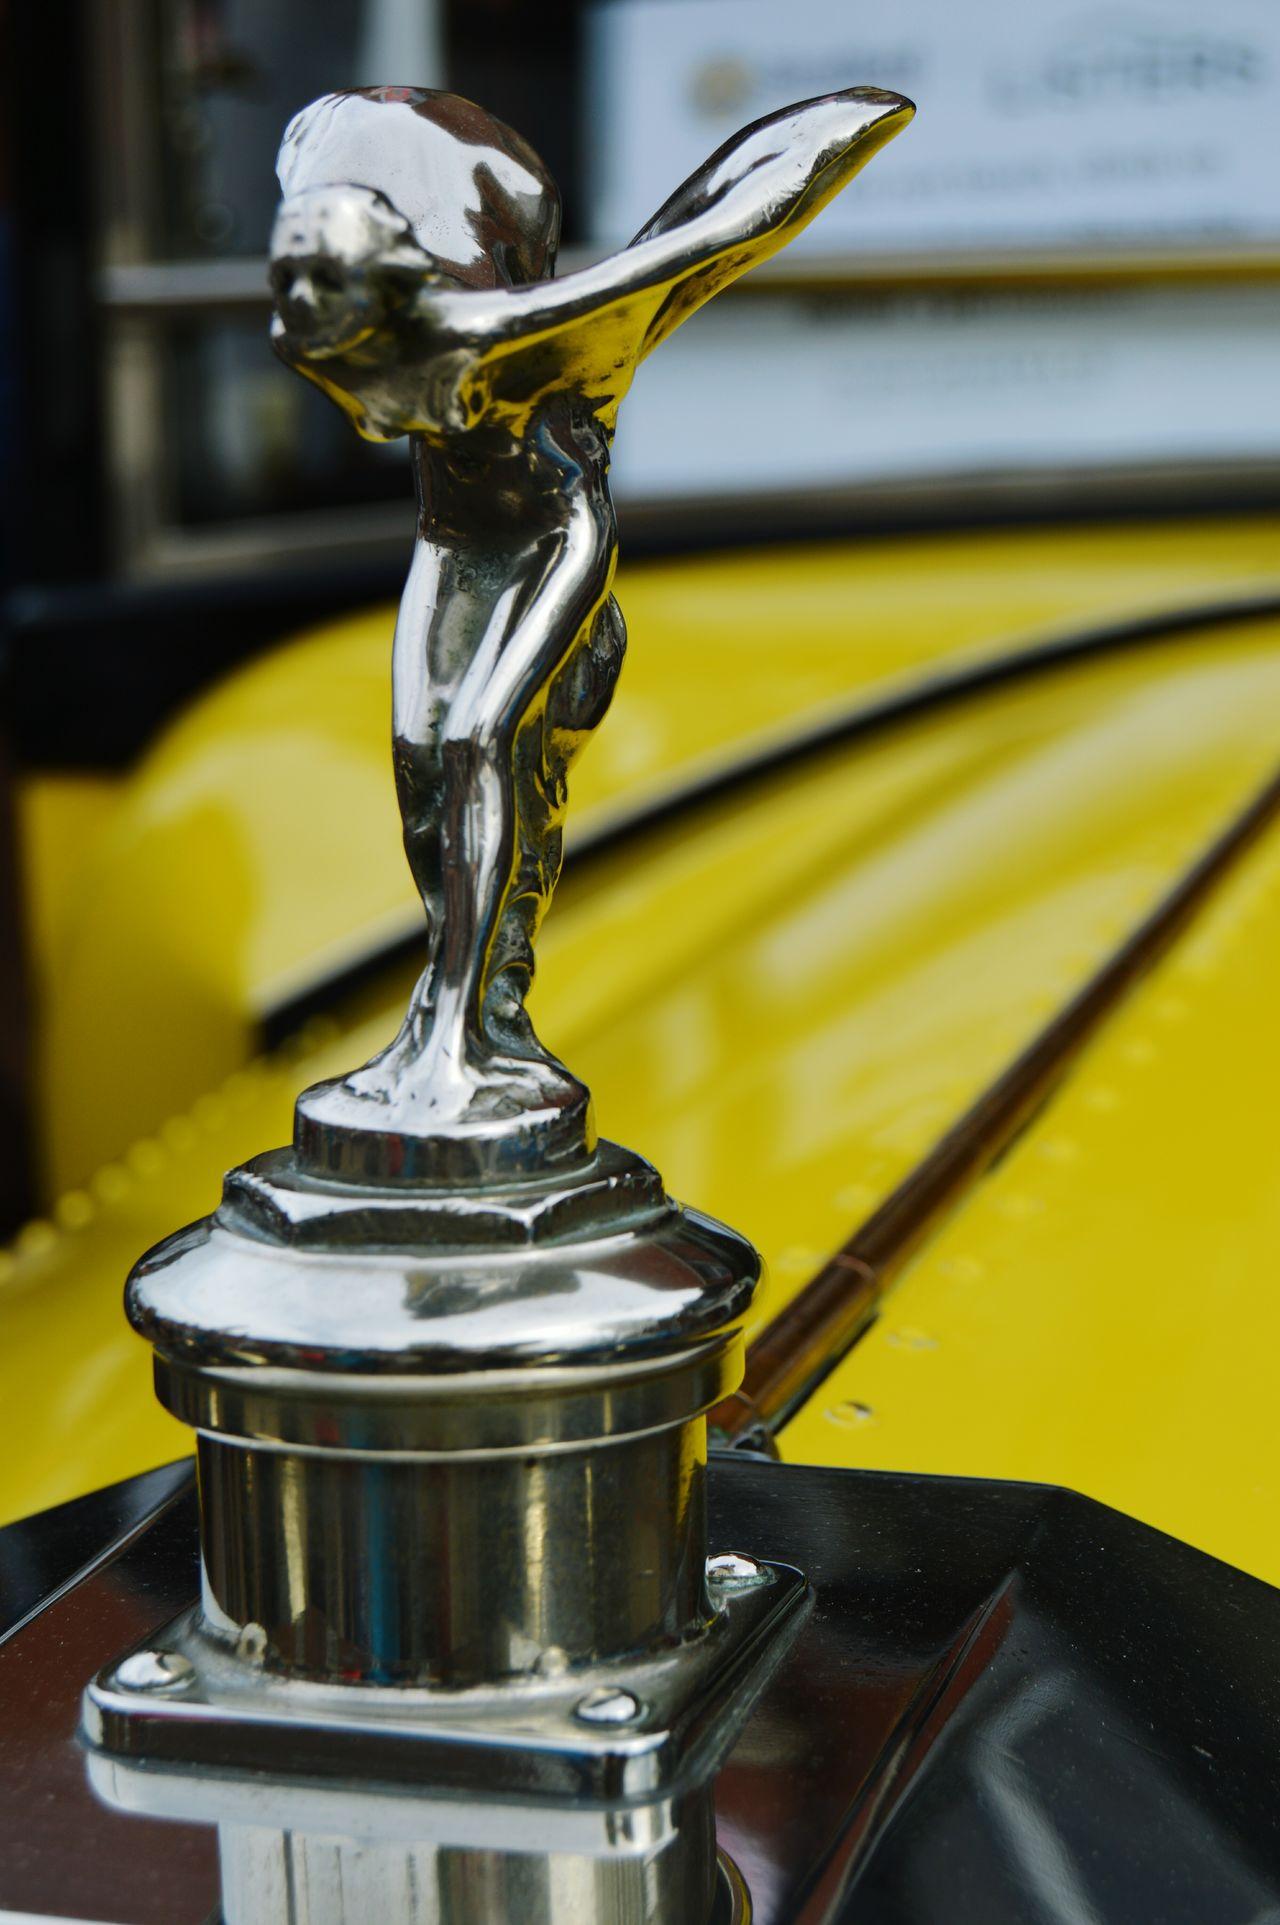 Car Bonnet Car Body Parts Rolls Royce Spirit Of Ecstasy Hood Ornament Close Up Classic Car Car Photography